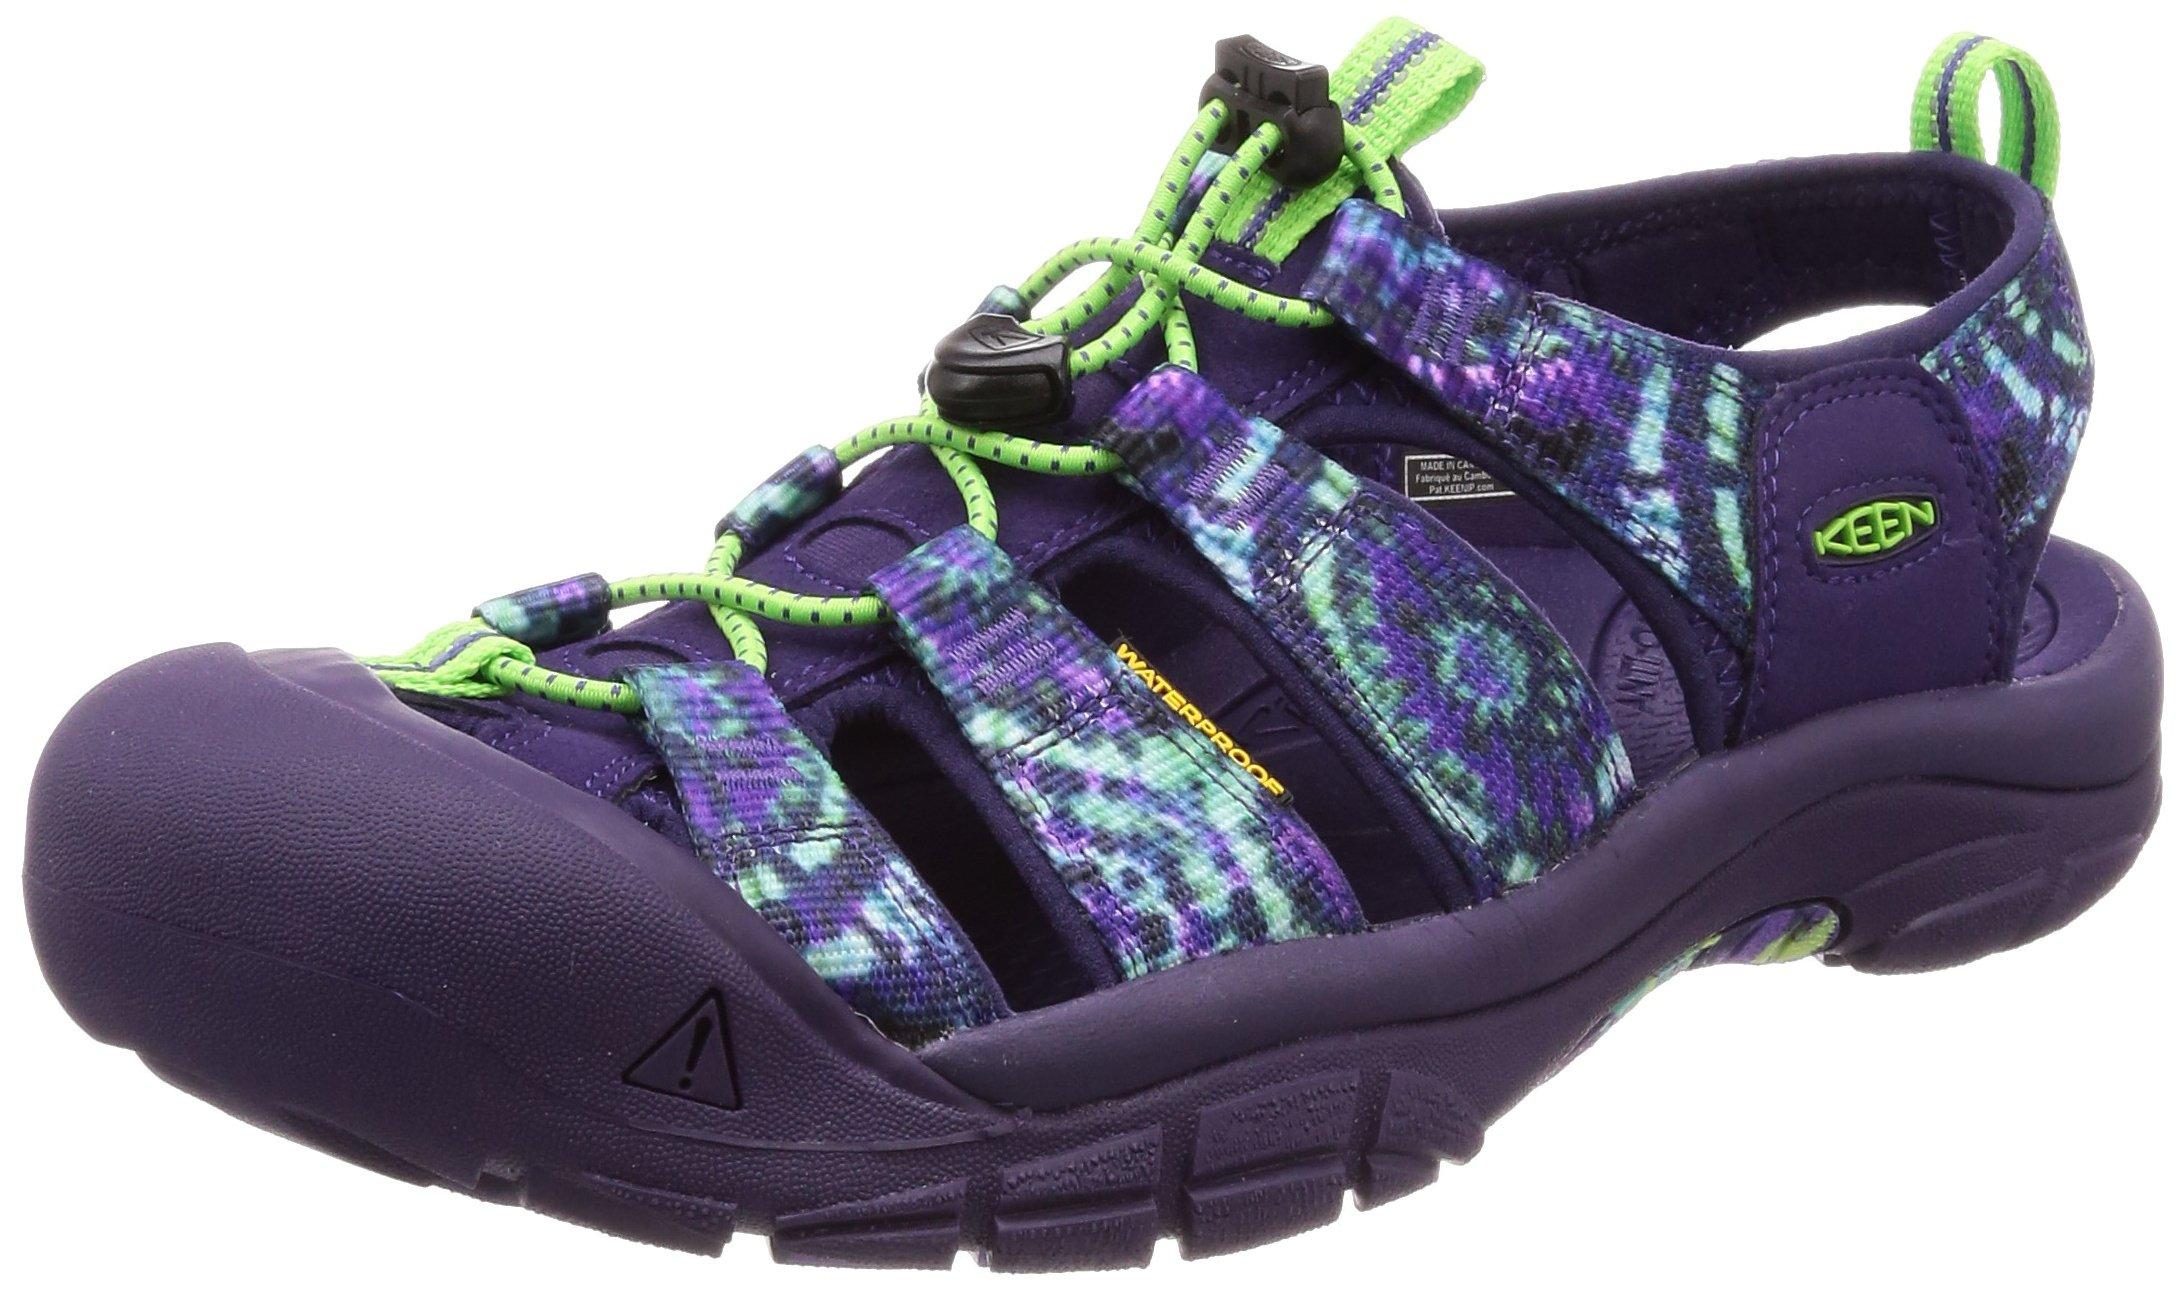 95664e89c5a KEEN Men's Newport Retro-M Sandal < Sandals < Clothing, Shoes ...